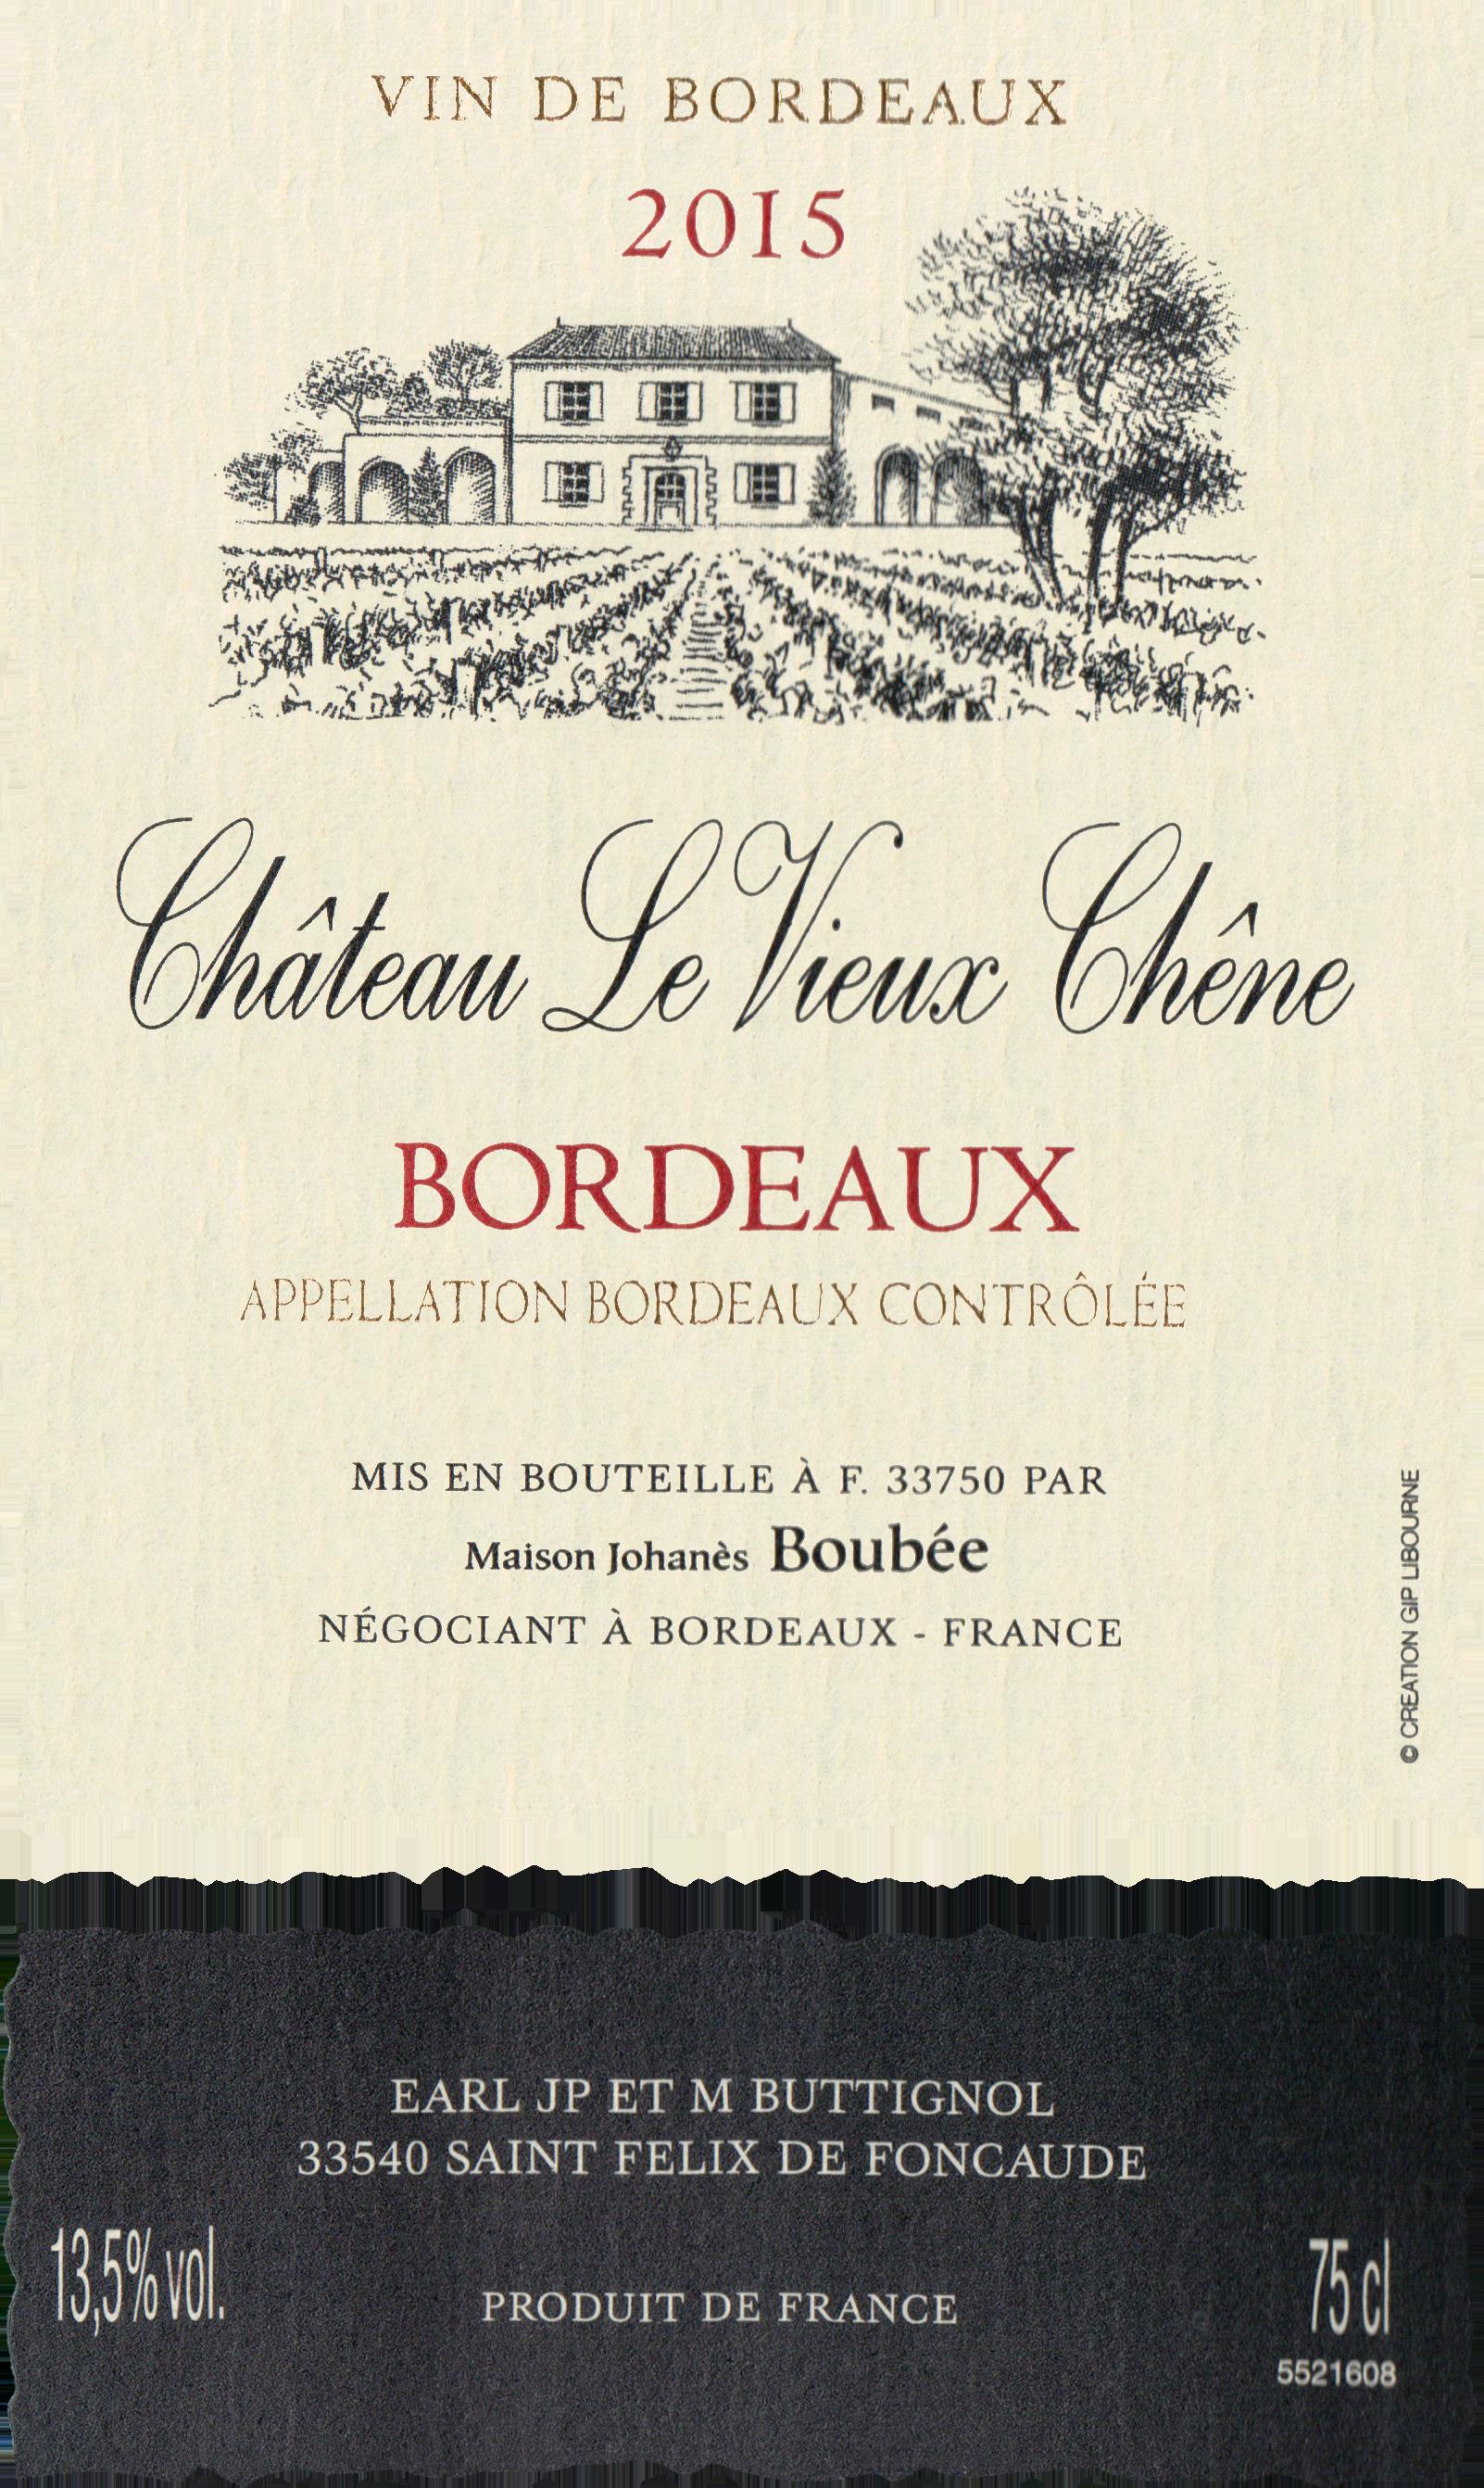 Chateau Vieux Chene 2015